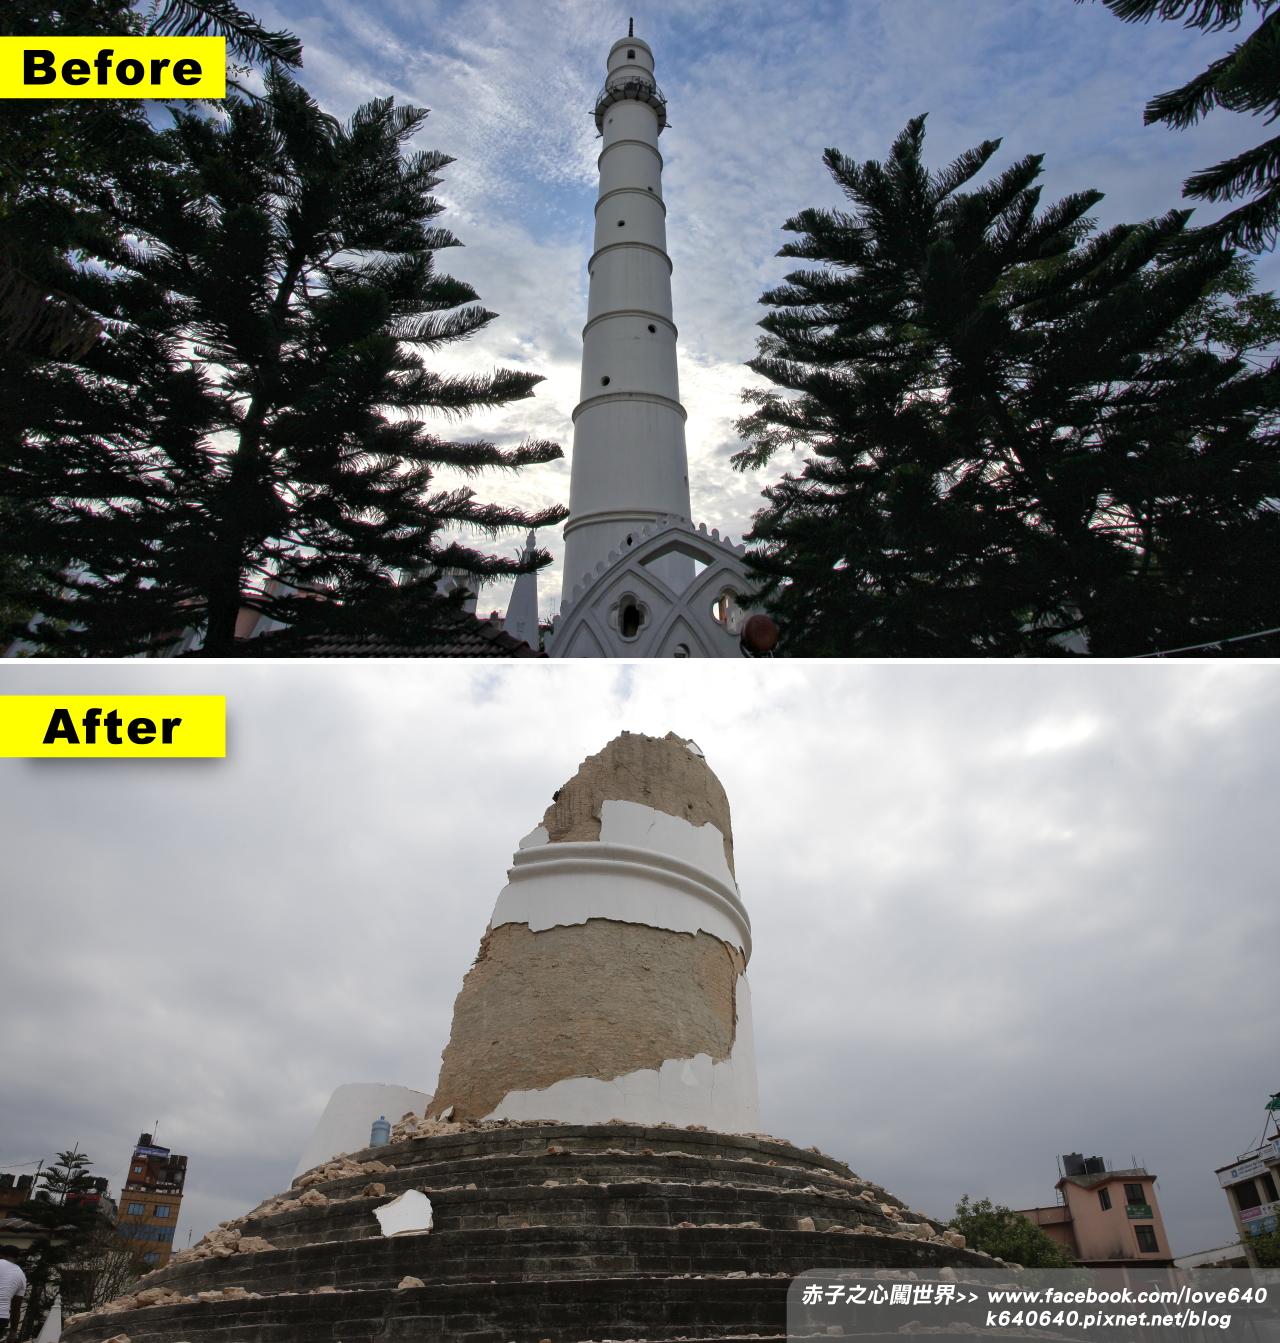 Nepal Kasthamandap earthquake-Bhimsen Tower